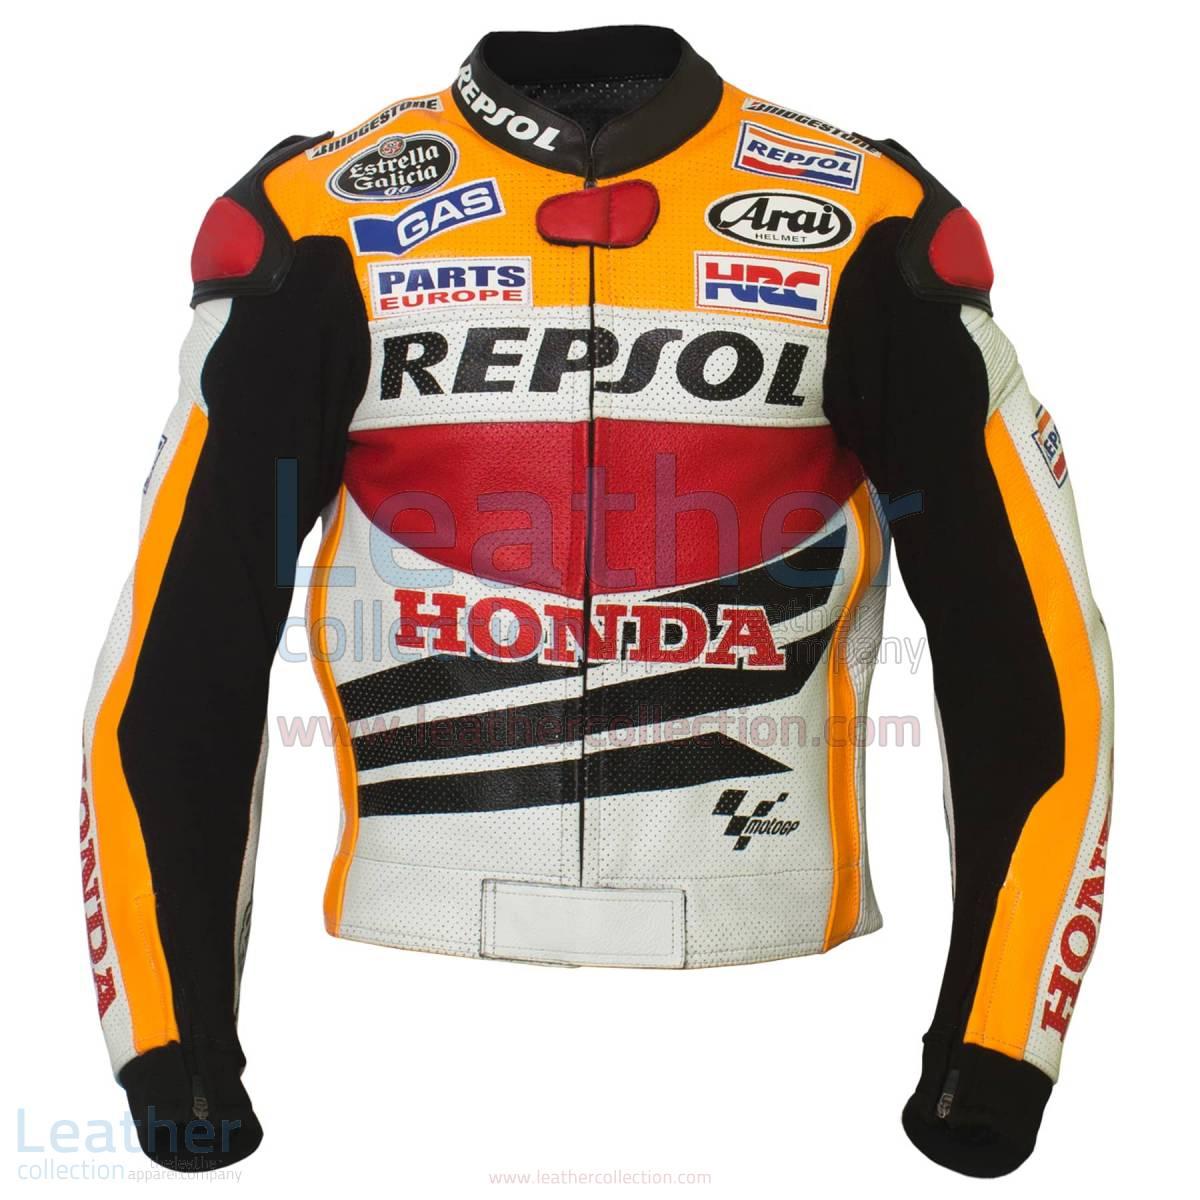 Dani Pedrosa Honda Repsol 2013 Motorcycle Jacket